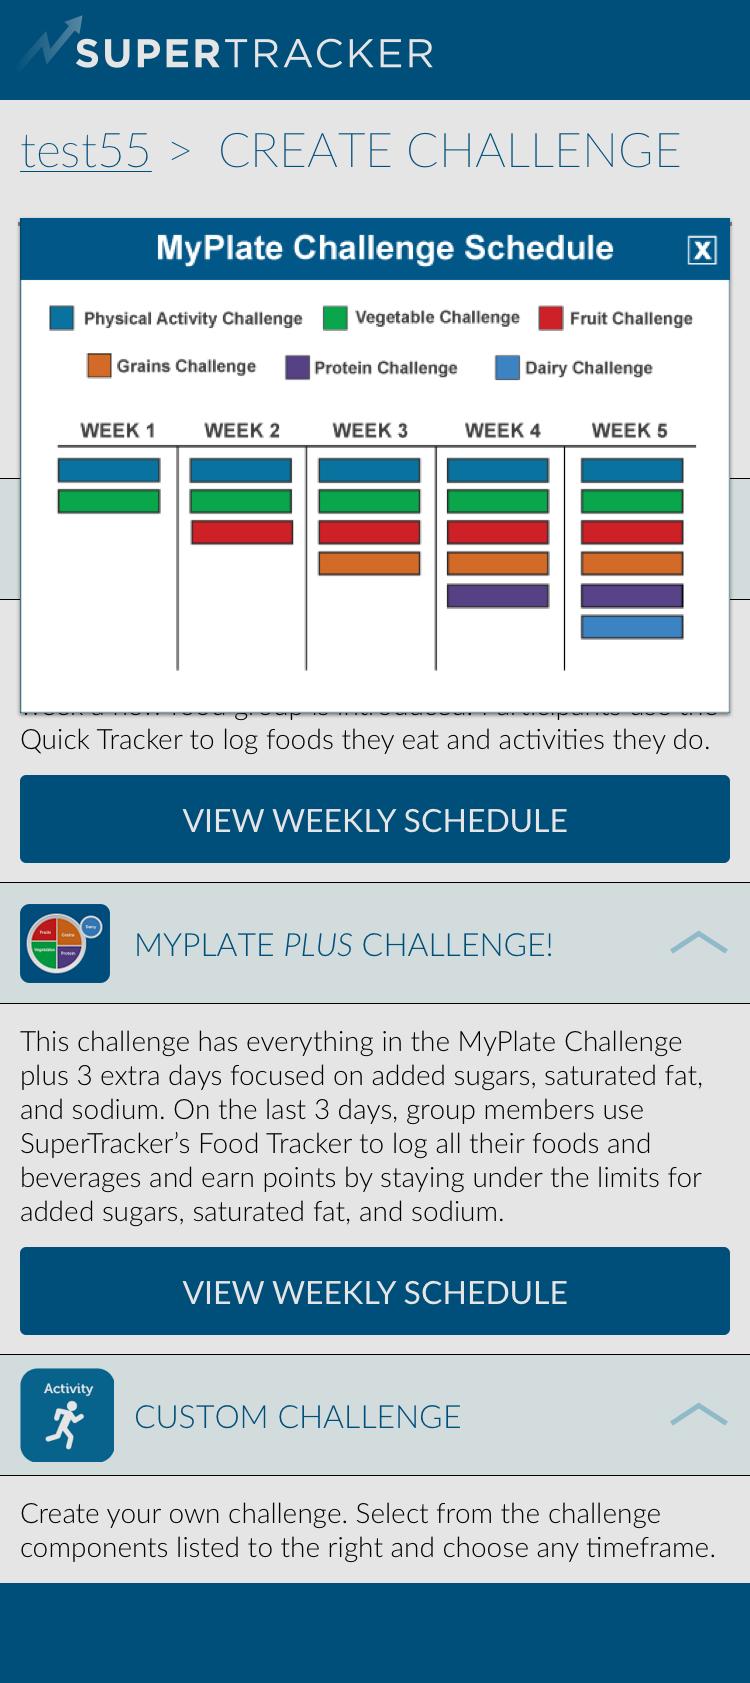 Custom - Create Challenge > View Weekly